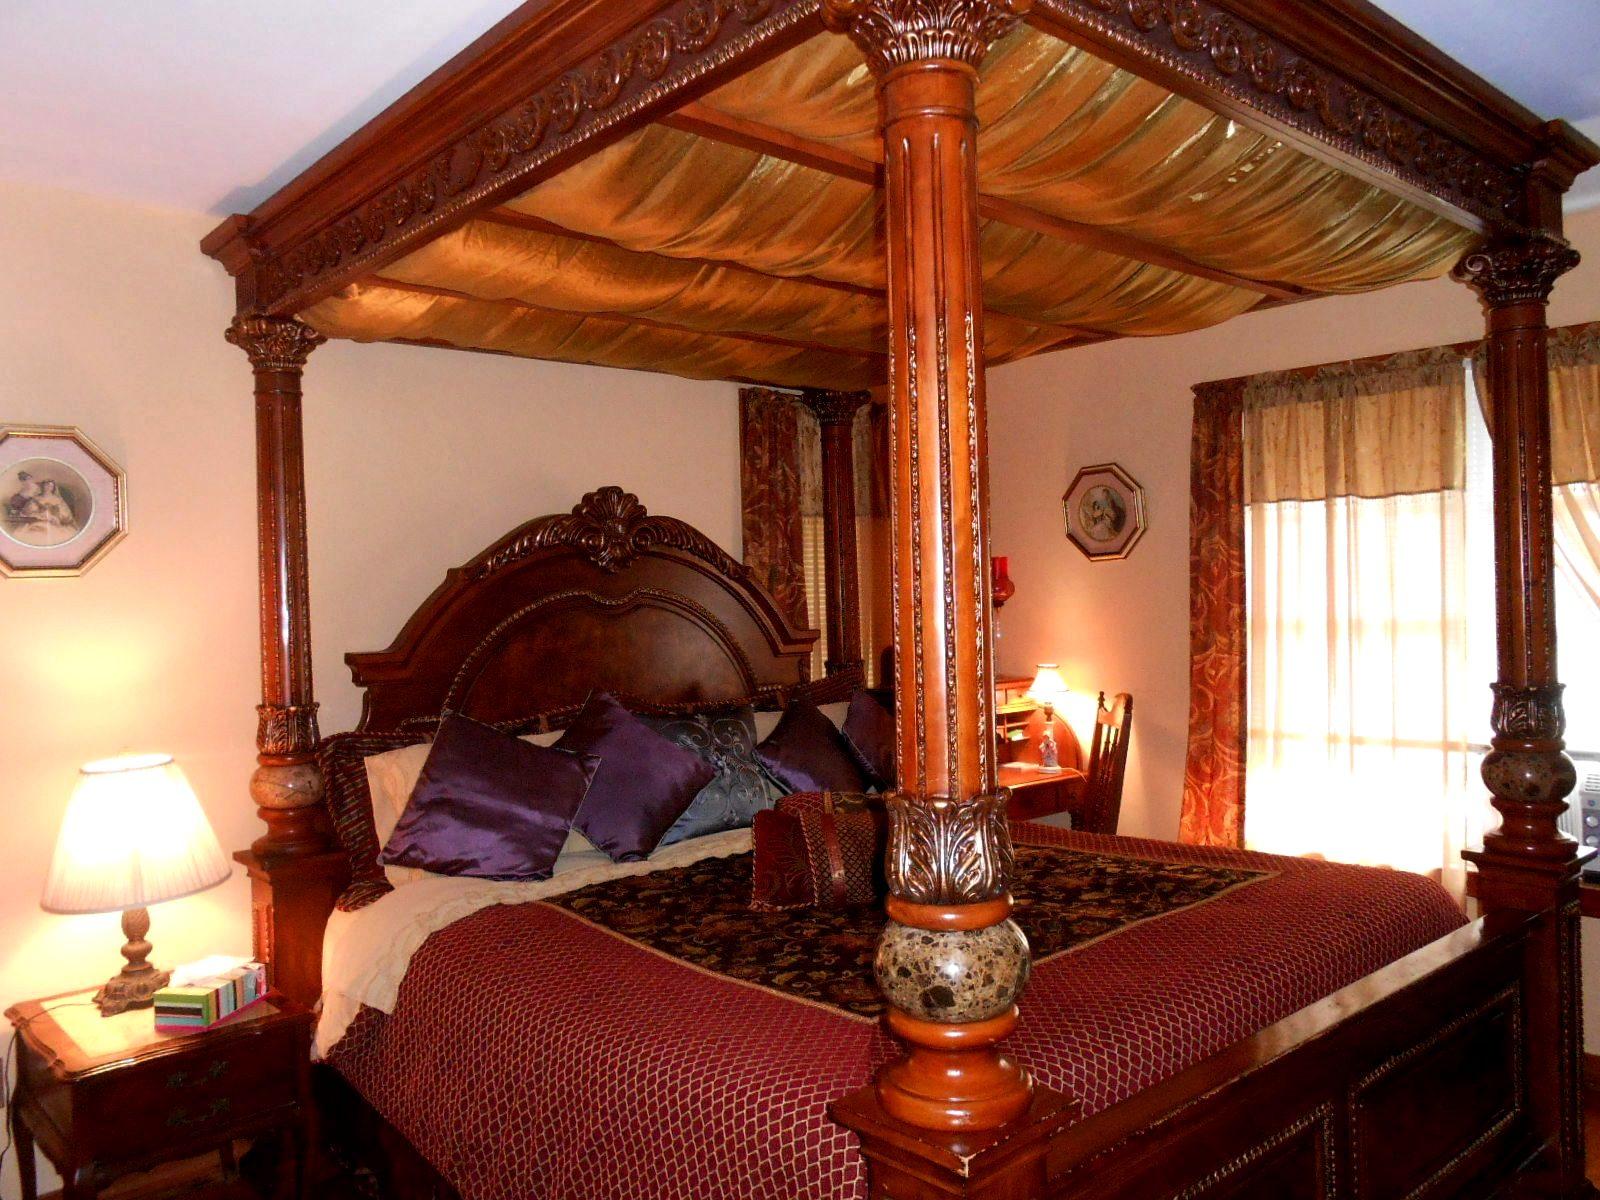 Rooms Rates Alla S Cozy Vacation Rental Guest House In Dallas Tx